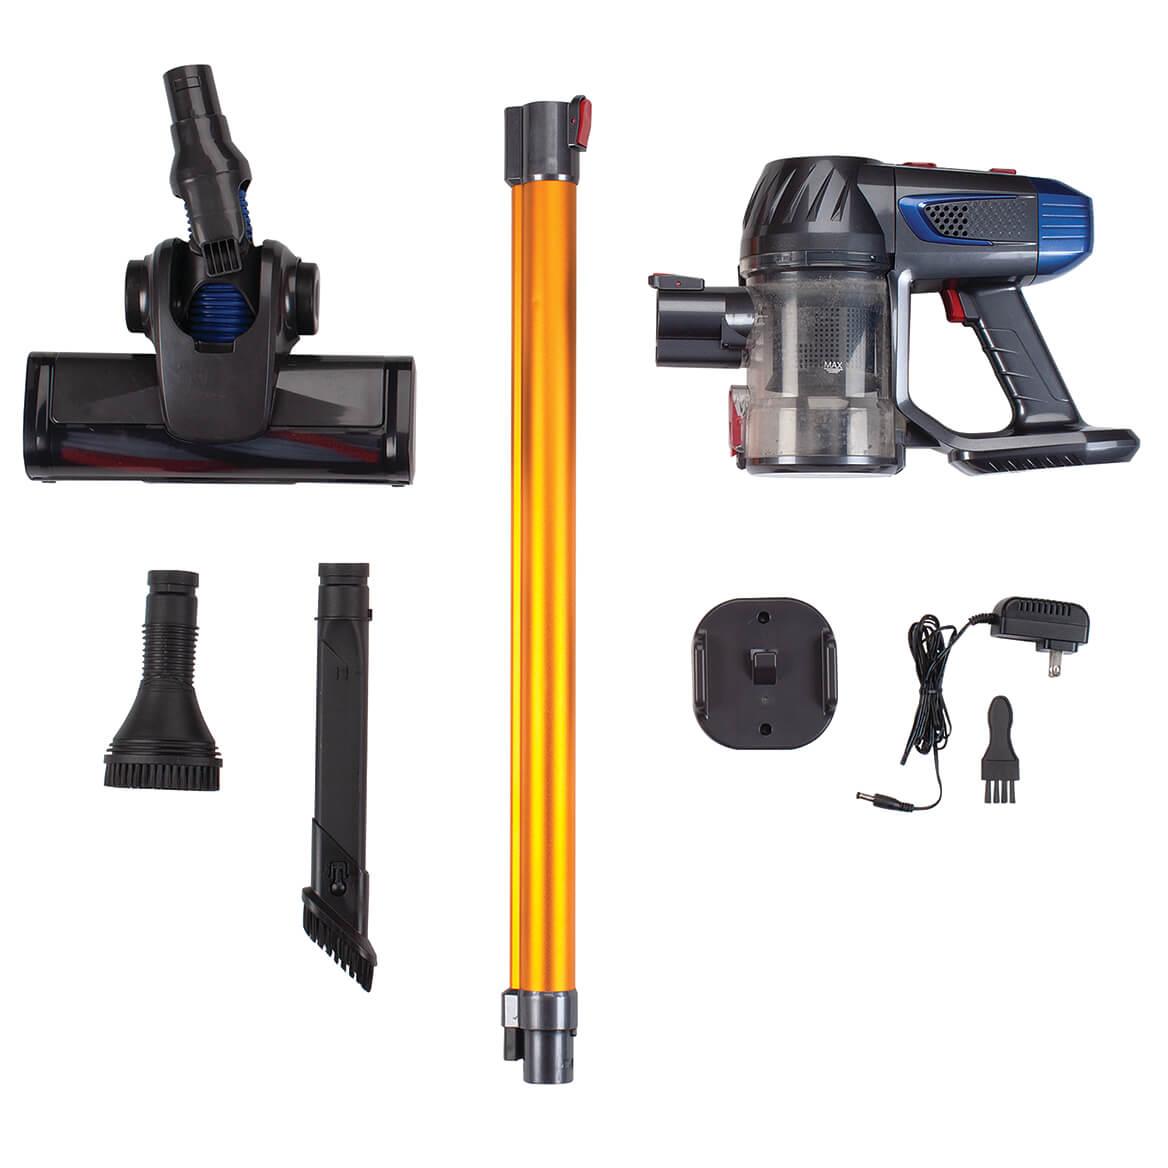 Handy Stick Cordless Vacuum by Living Sure-370727